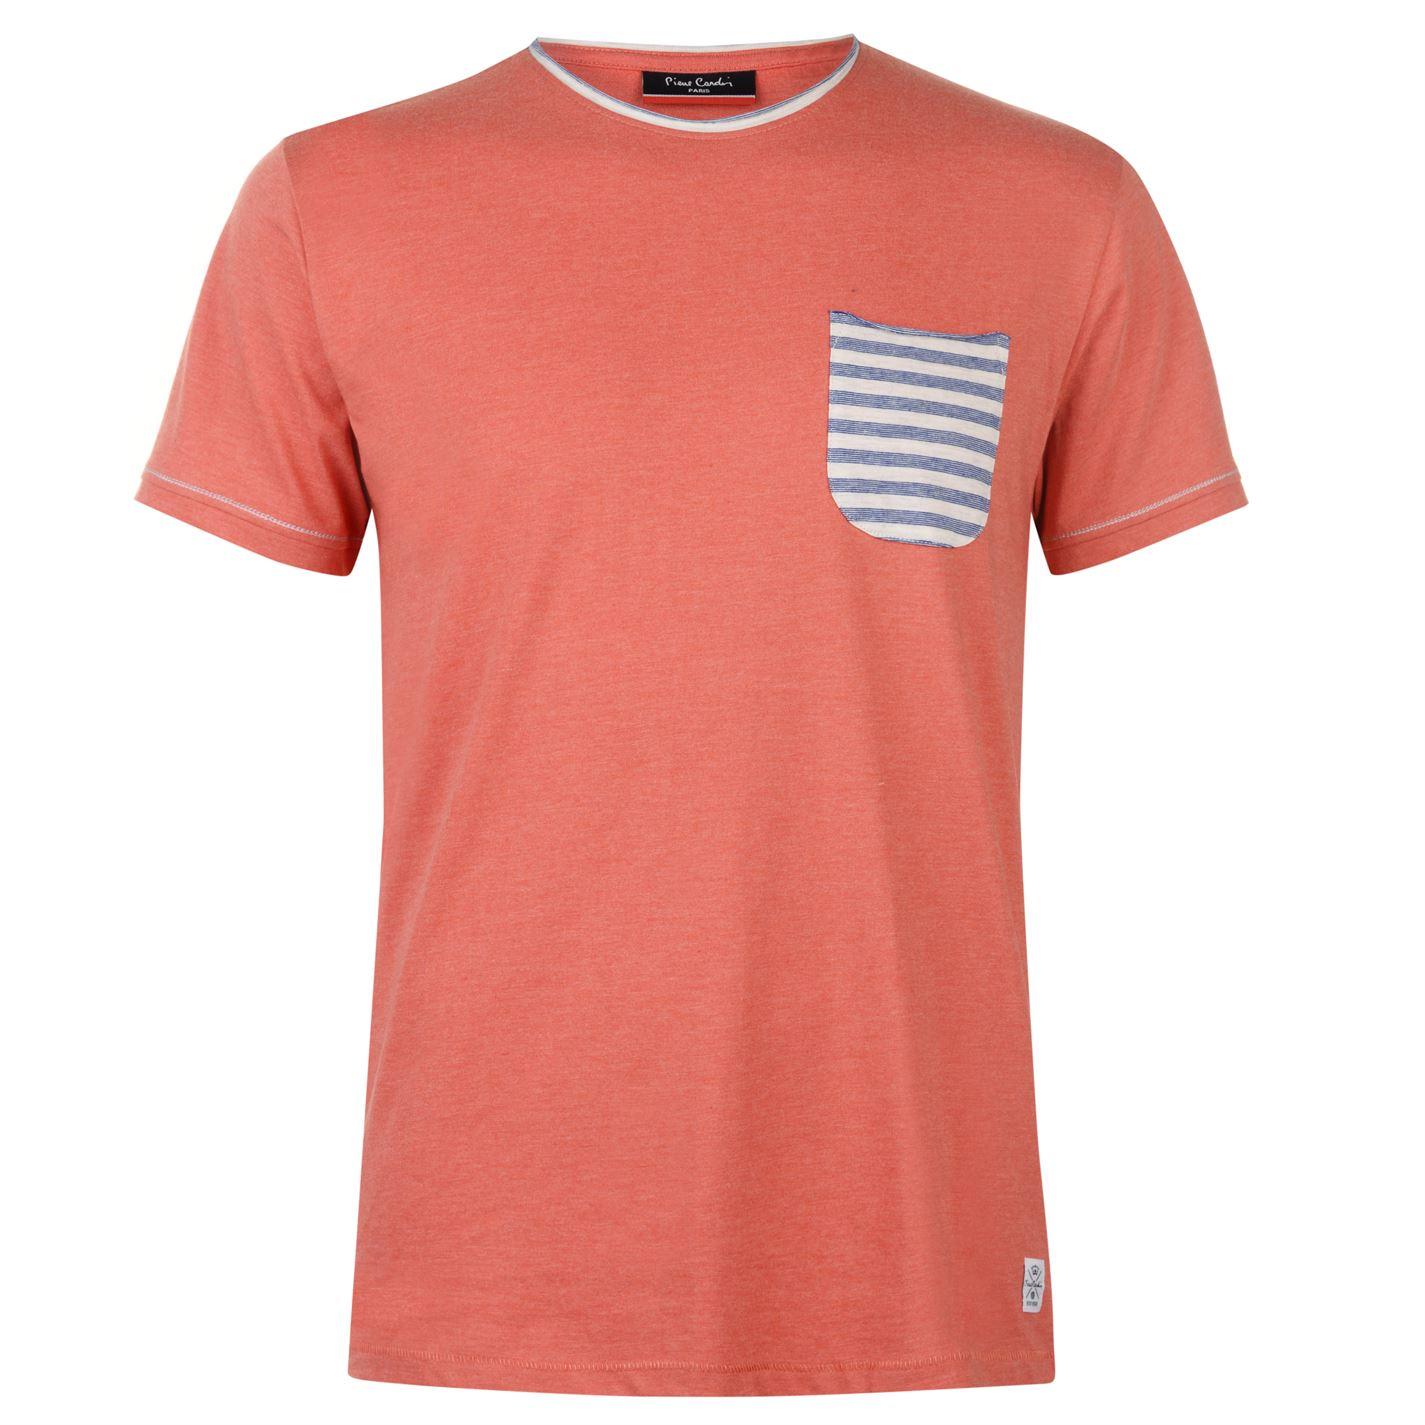 Triko Triko Pierre Cardin Stripe Pocket T Shirt pánske